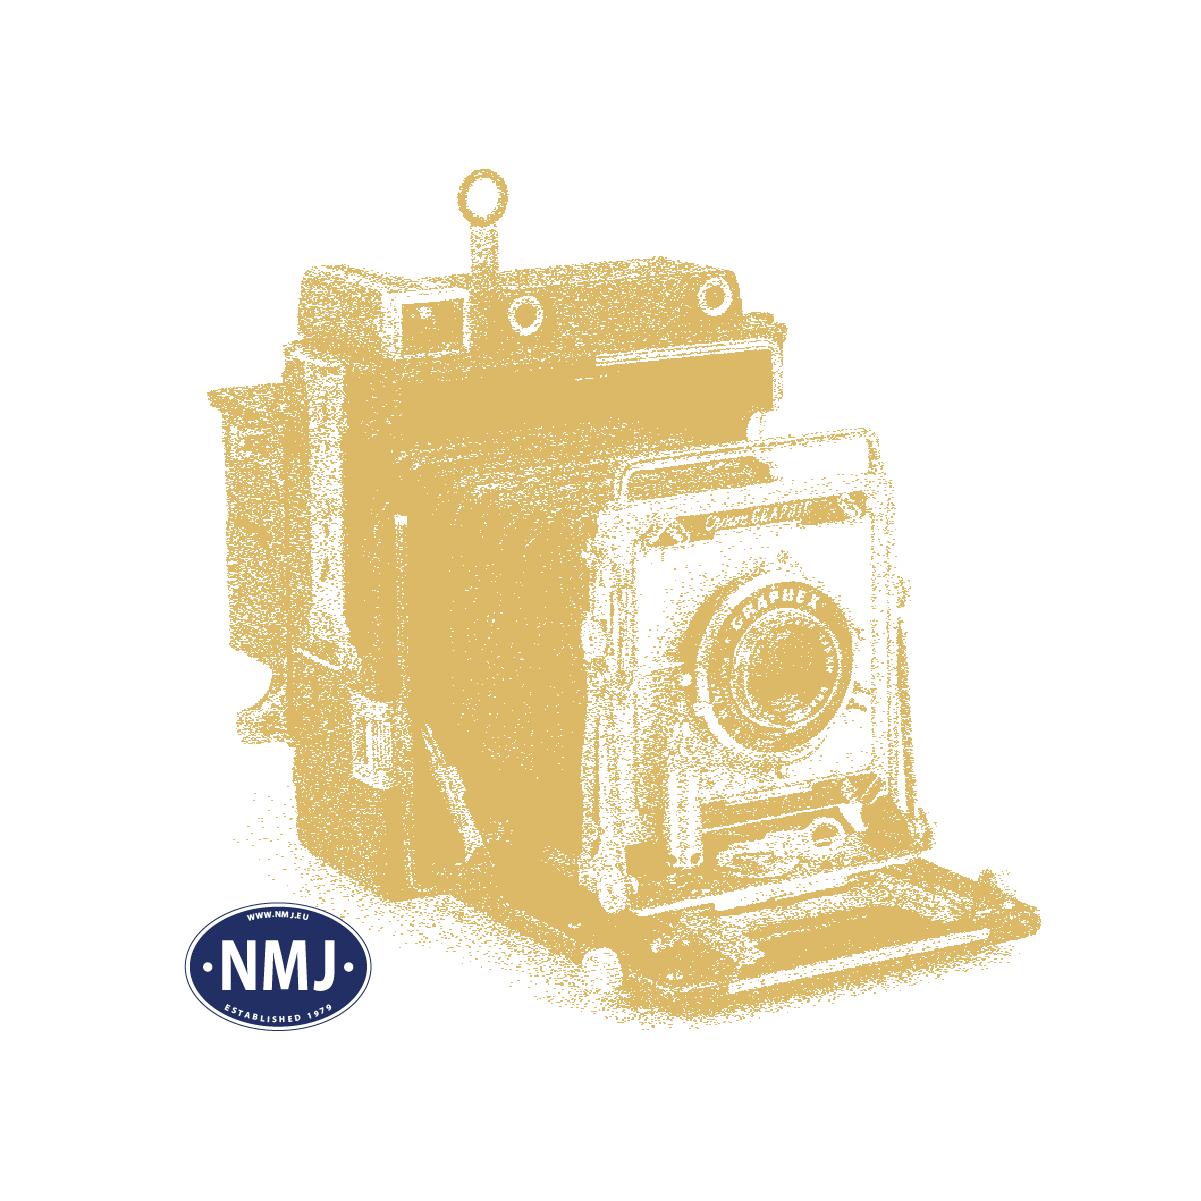 NMJT90206 - NMJ Topline MAV M61.003, DCC Sound